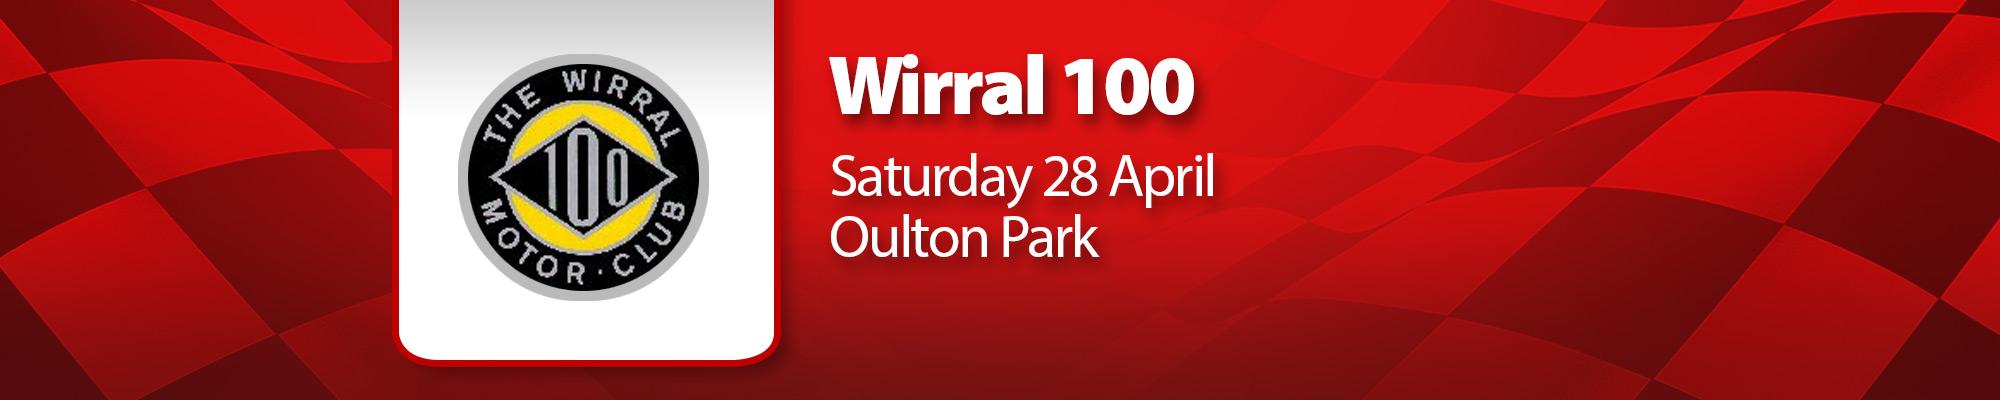 Wirral 100 Club Bike Championships